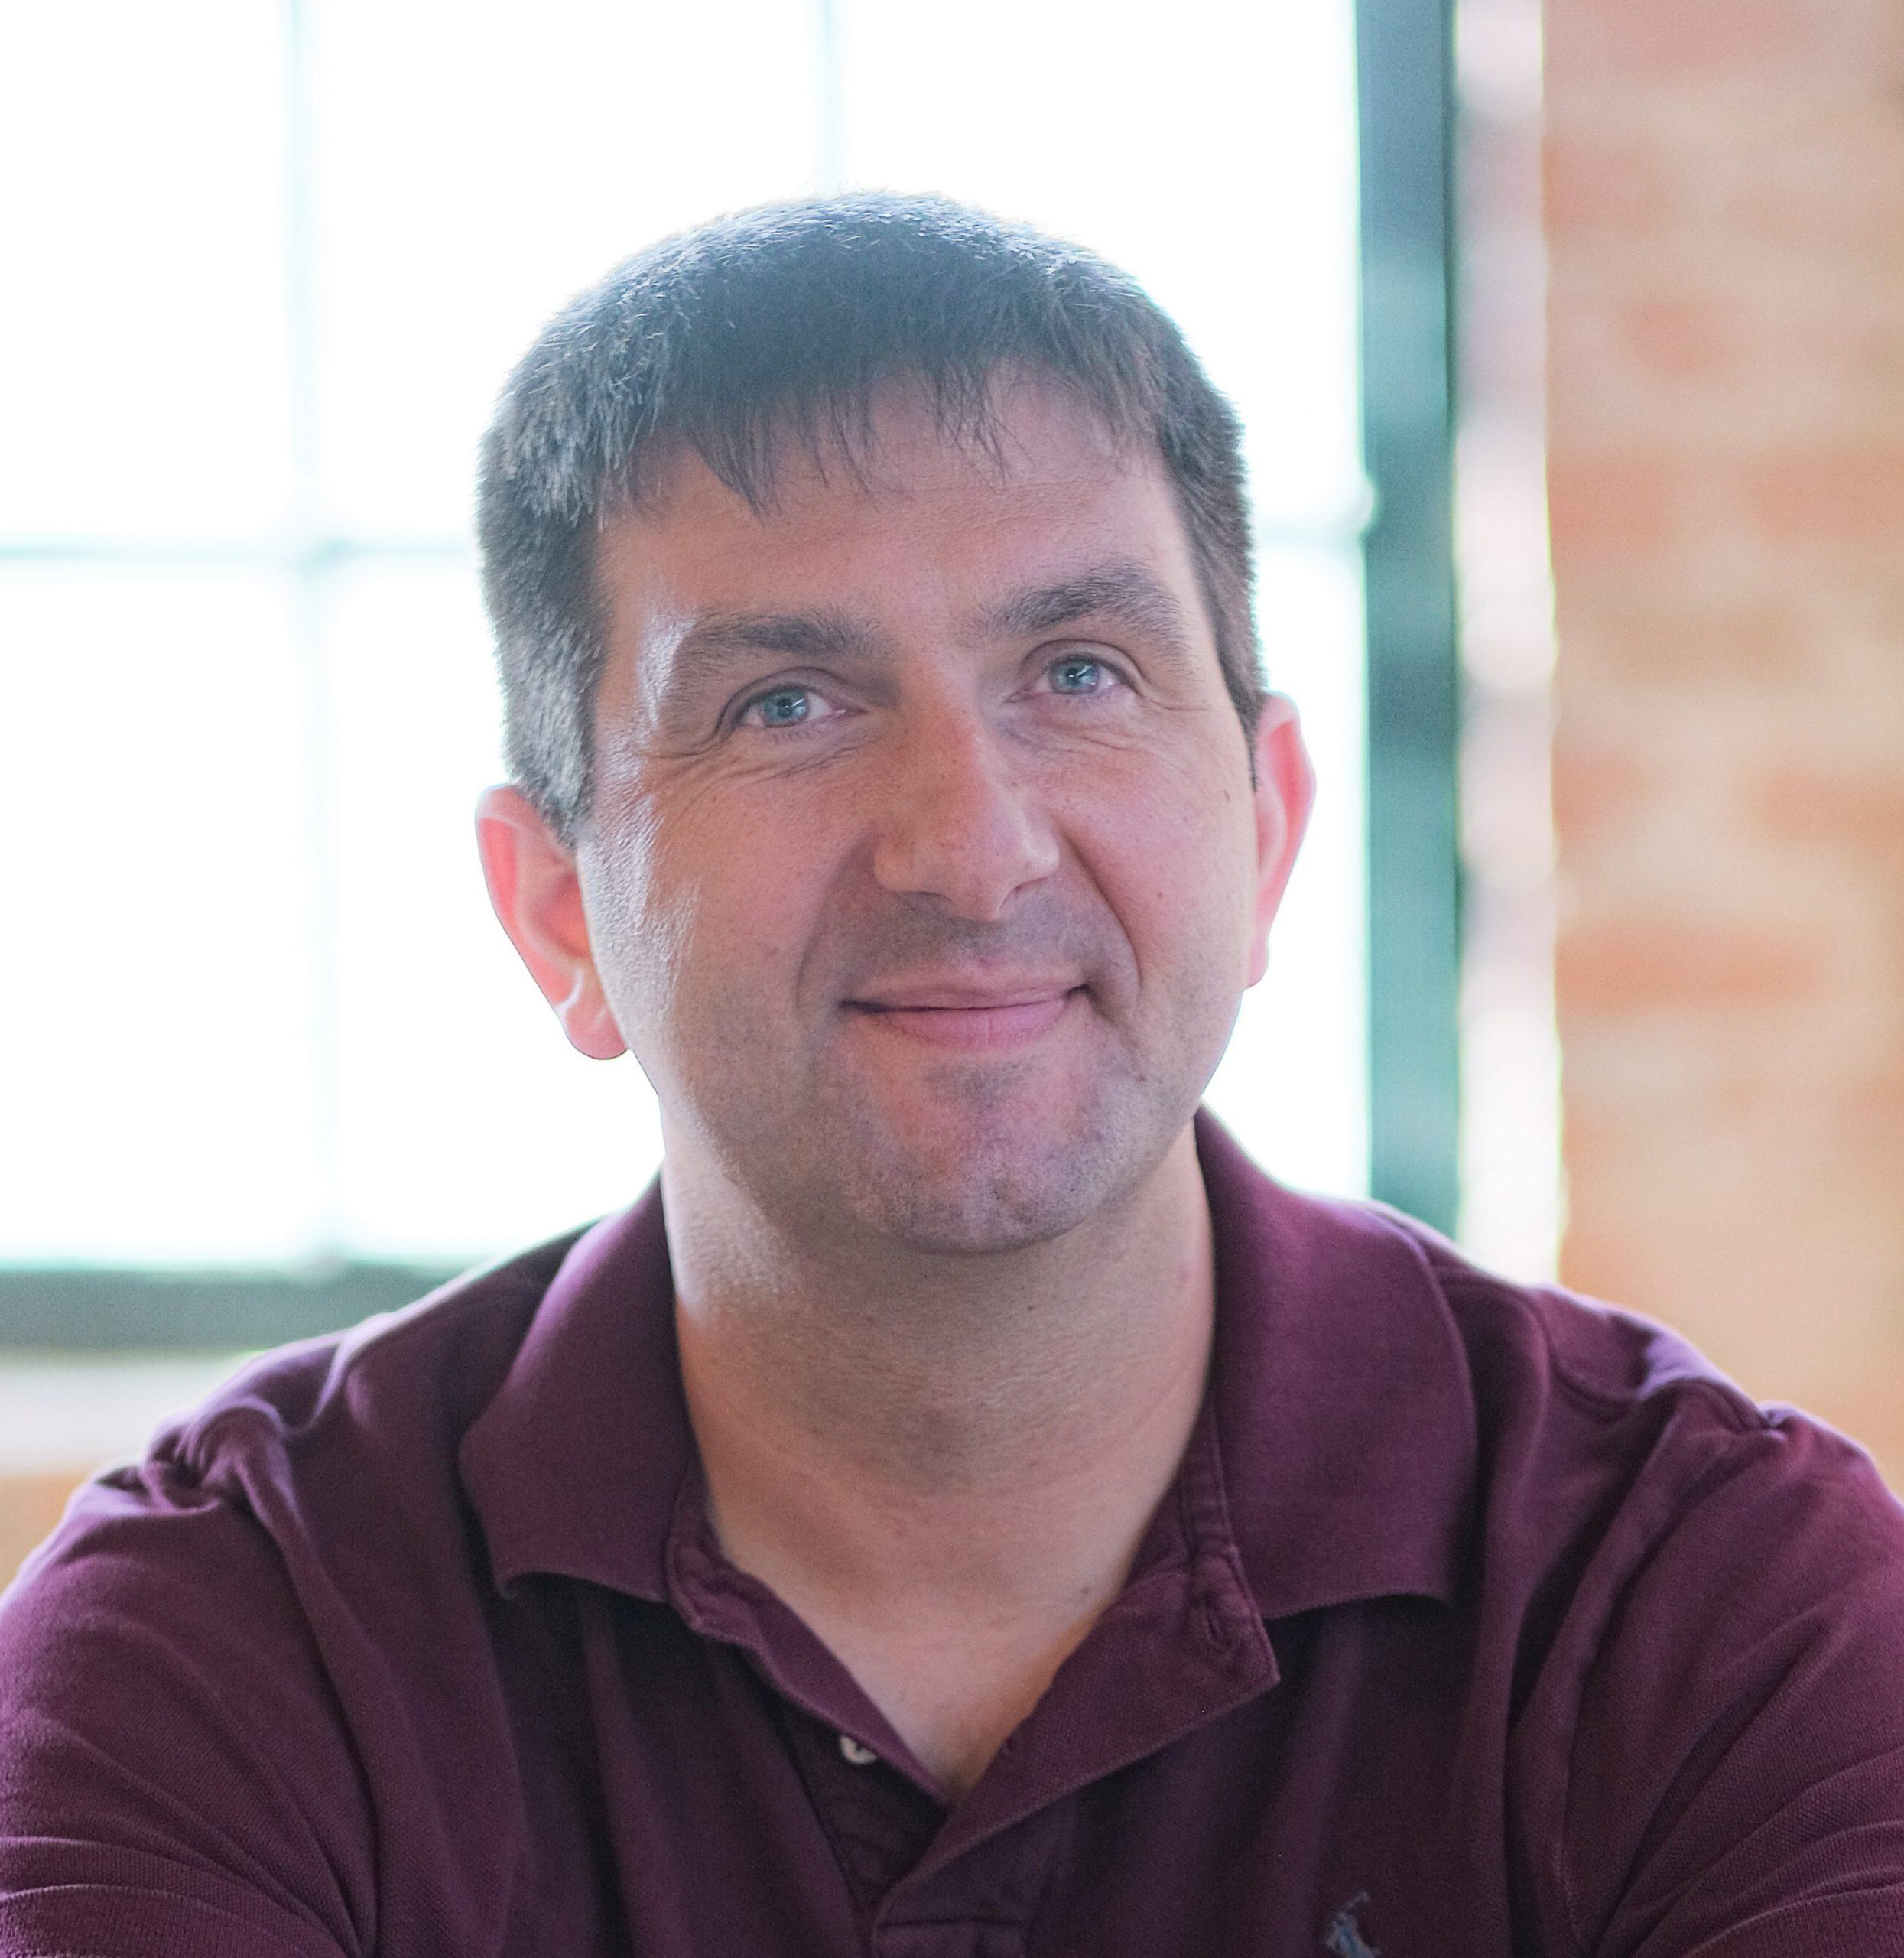 Mike Onieu ICISF-Canada Board Member